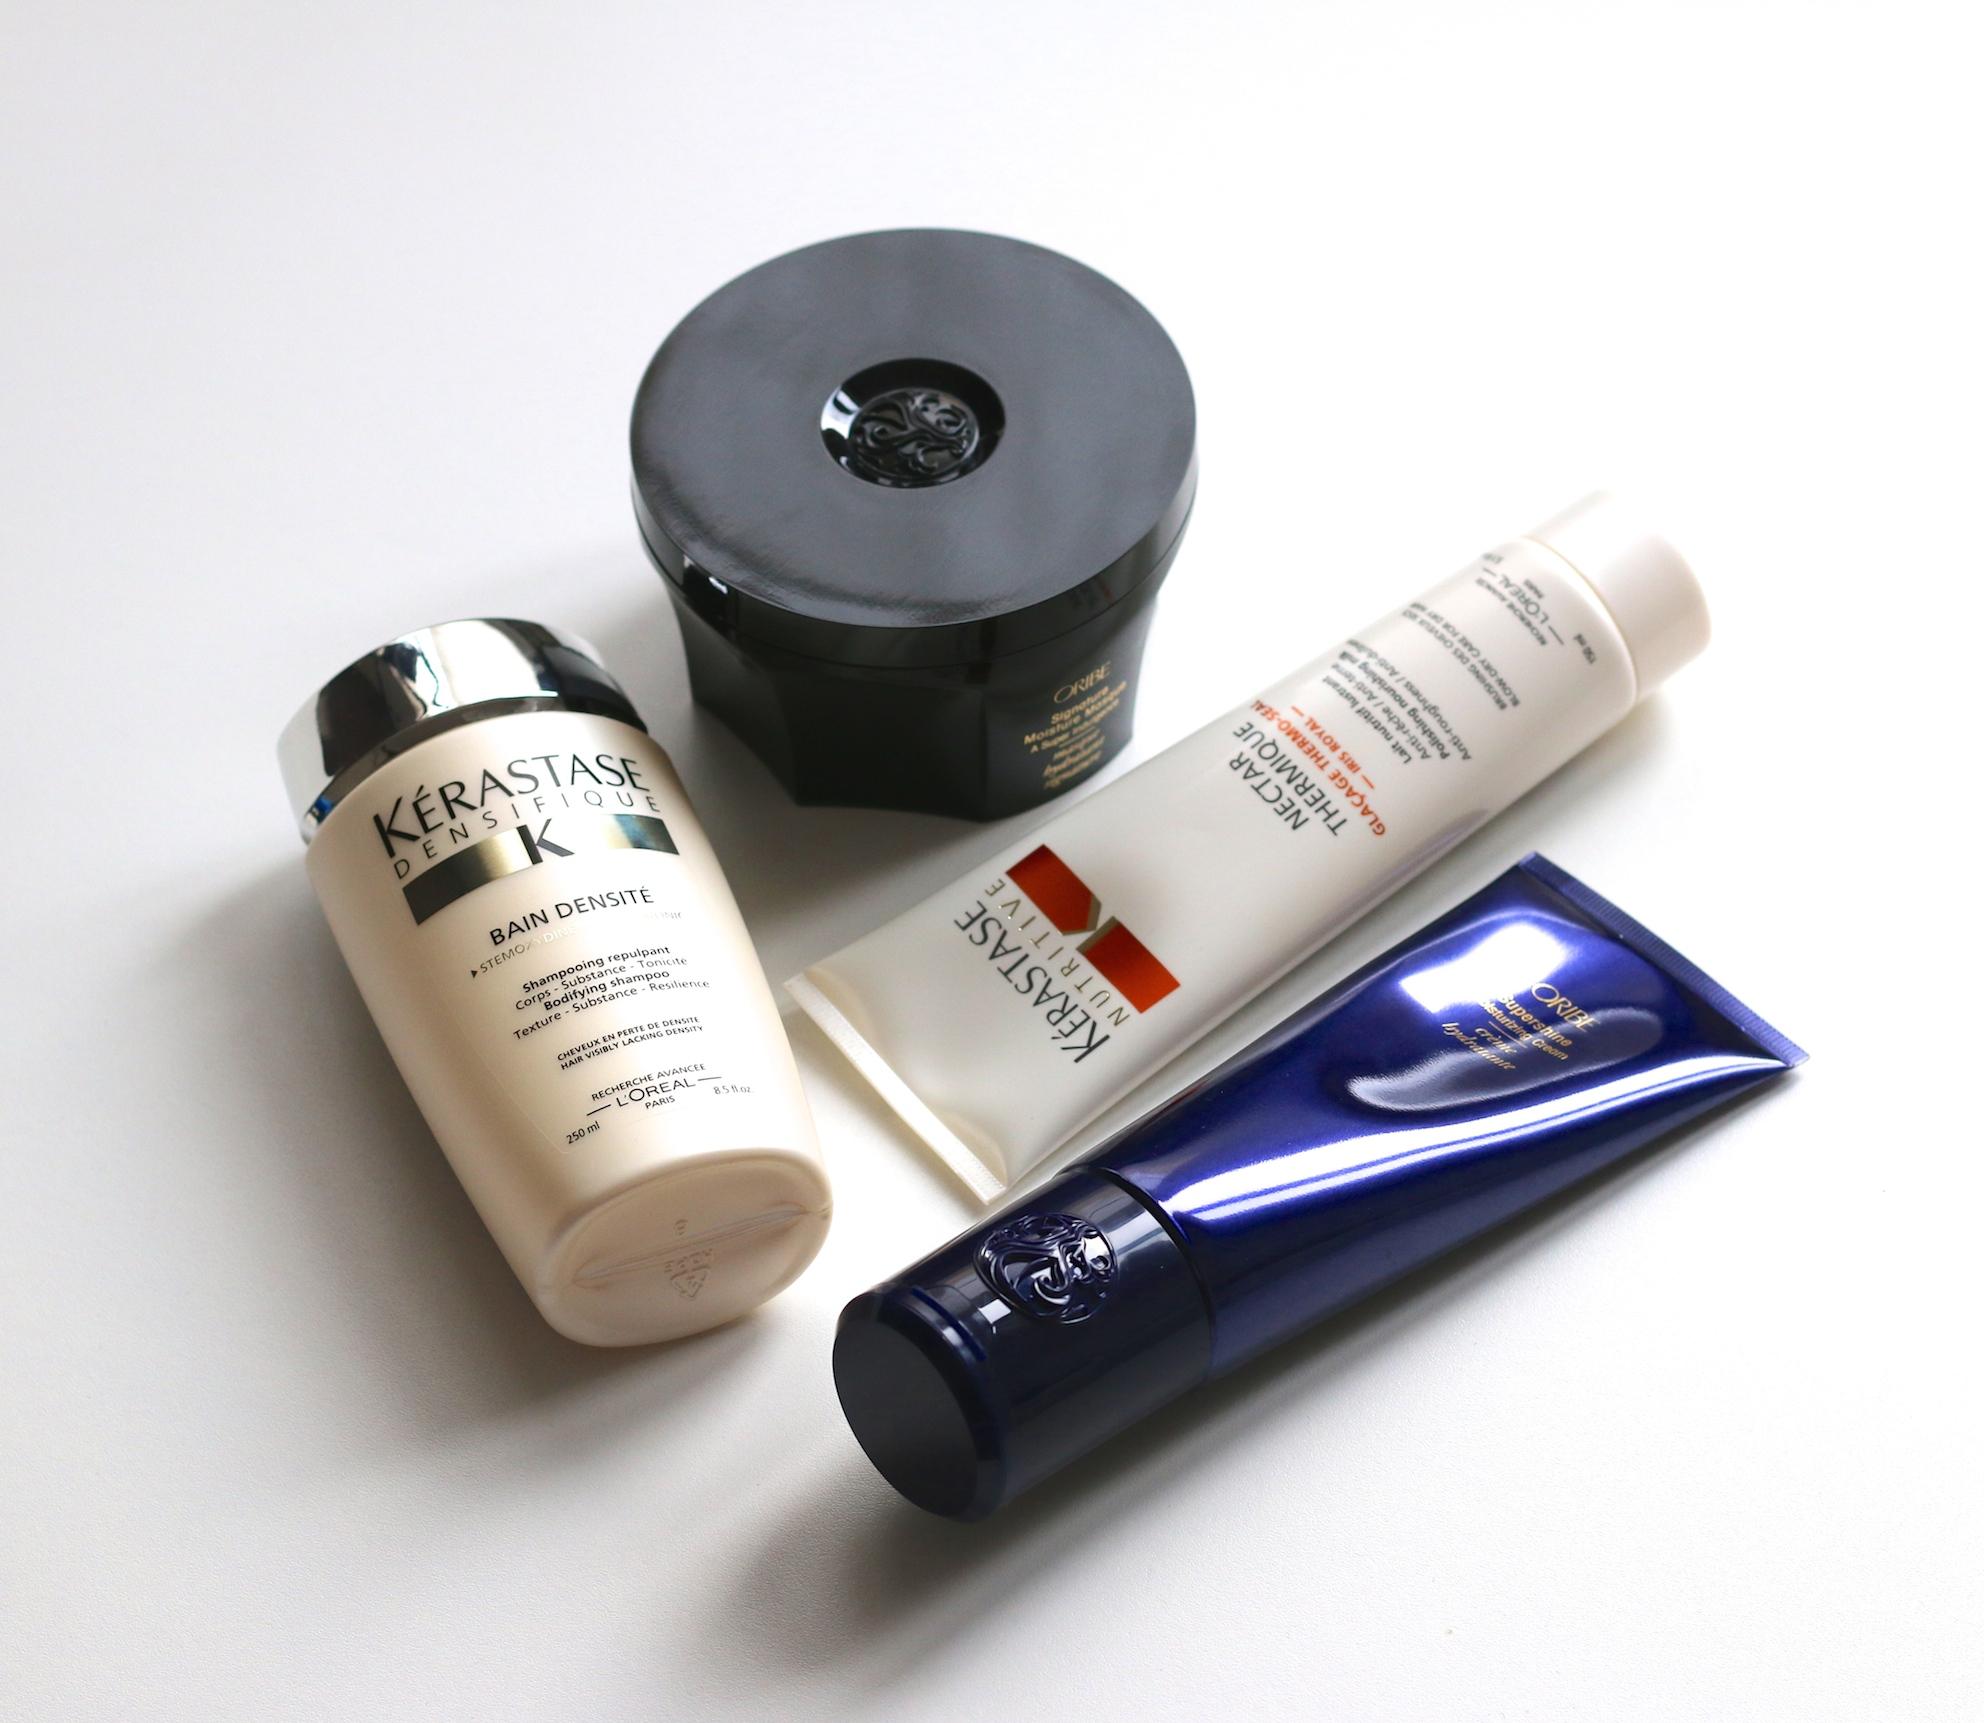 New Hair Care Routine Oribe Kerastase The Brush Stash